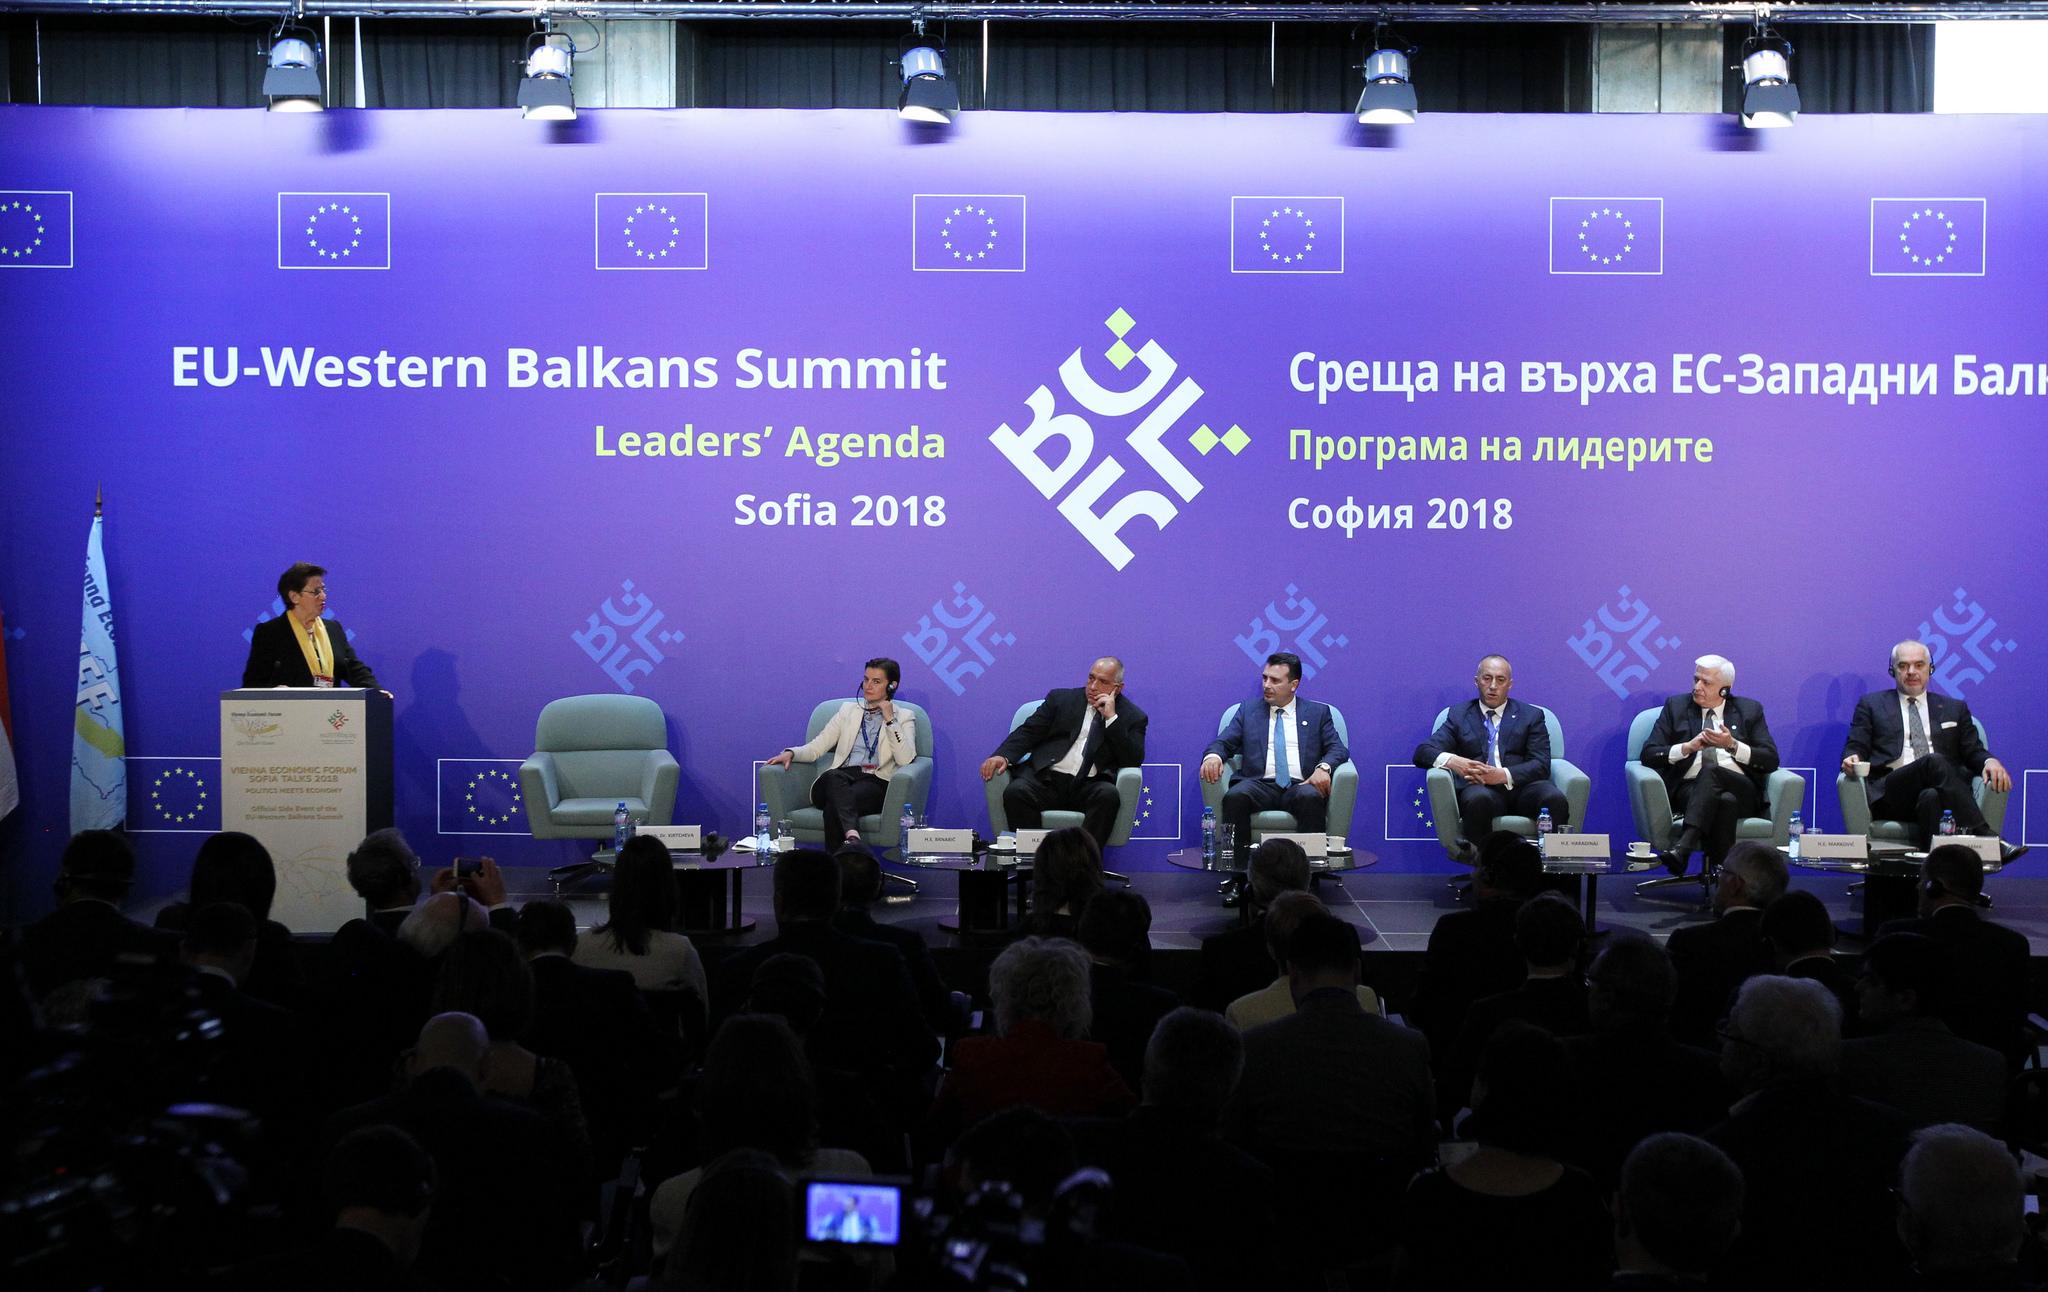 Vienna Economic Forum: Business should lead the politics of